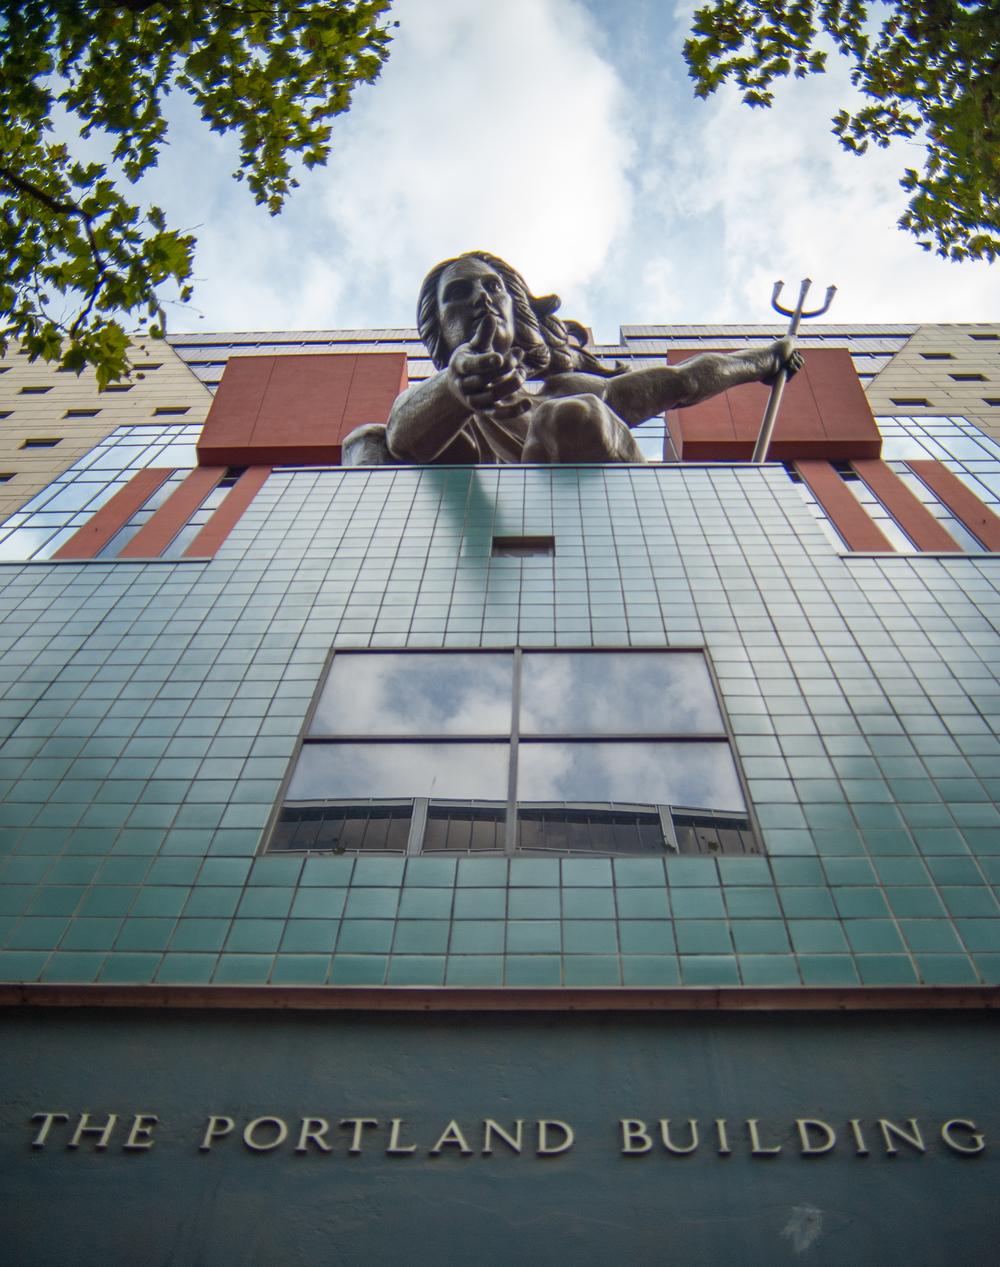 Portlandia-DAY-2.jpg